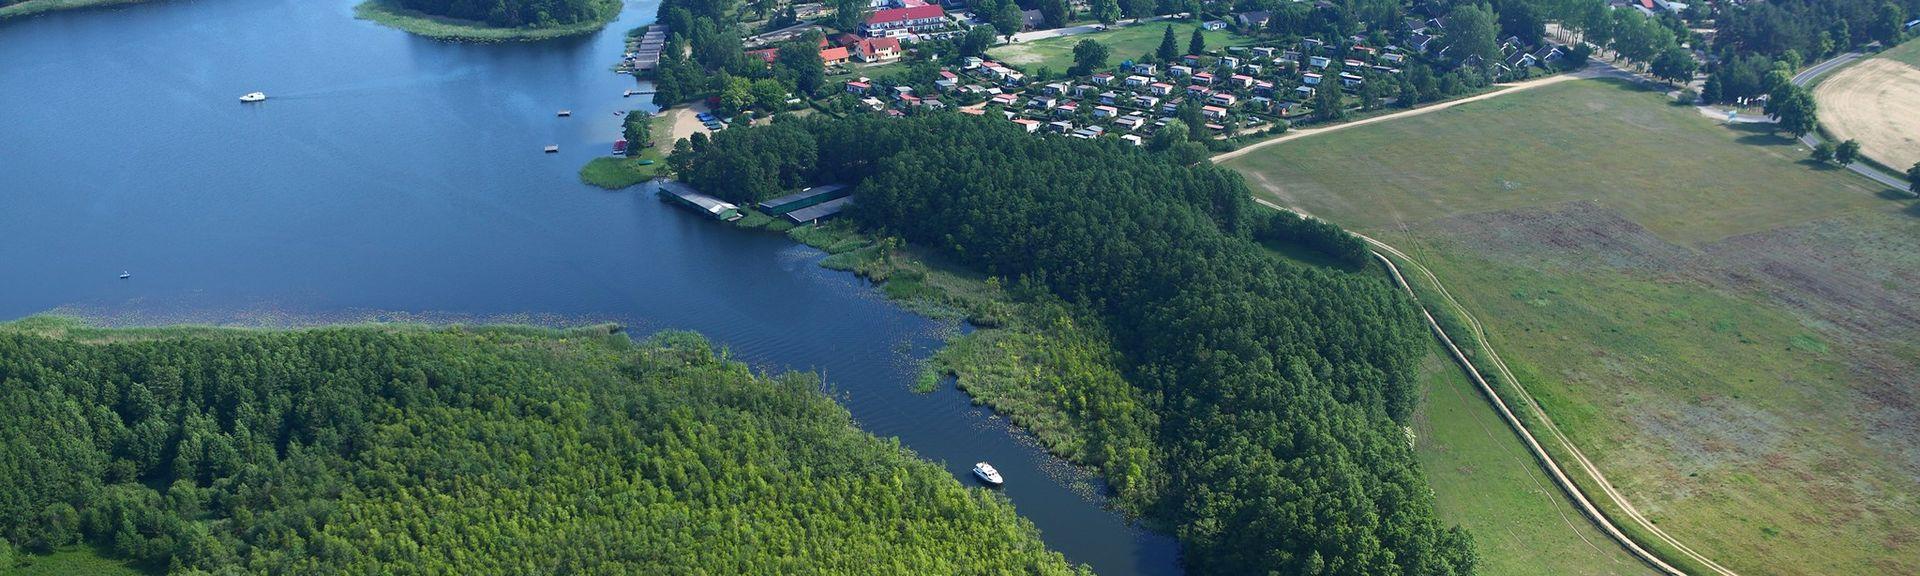 Rheinsberg, Région de Brandenbourg, Allemagne